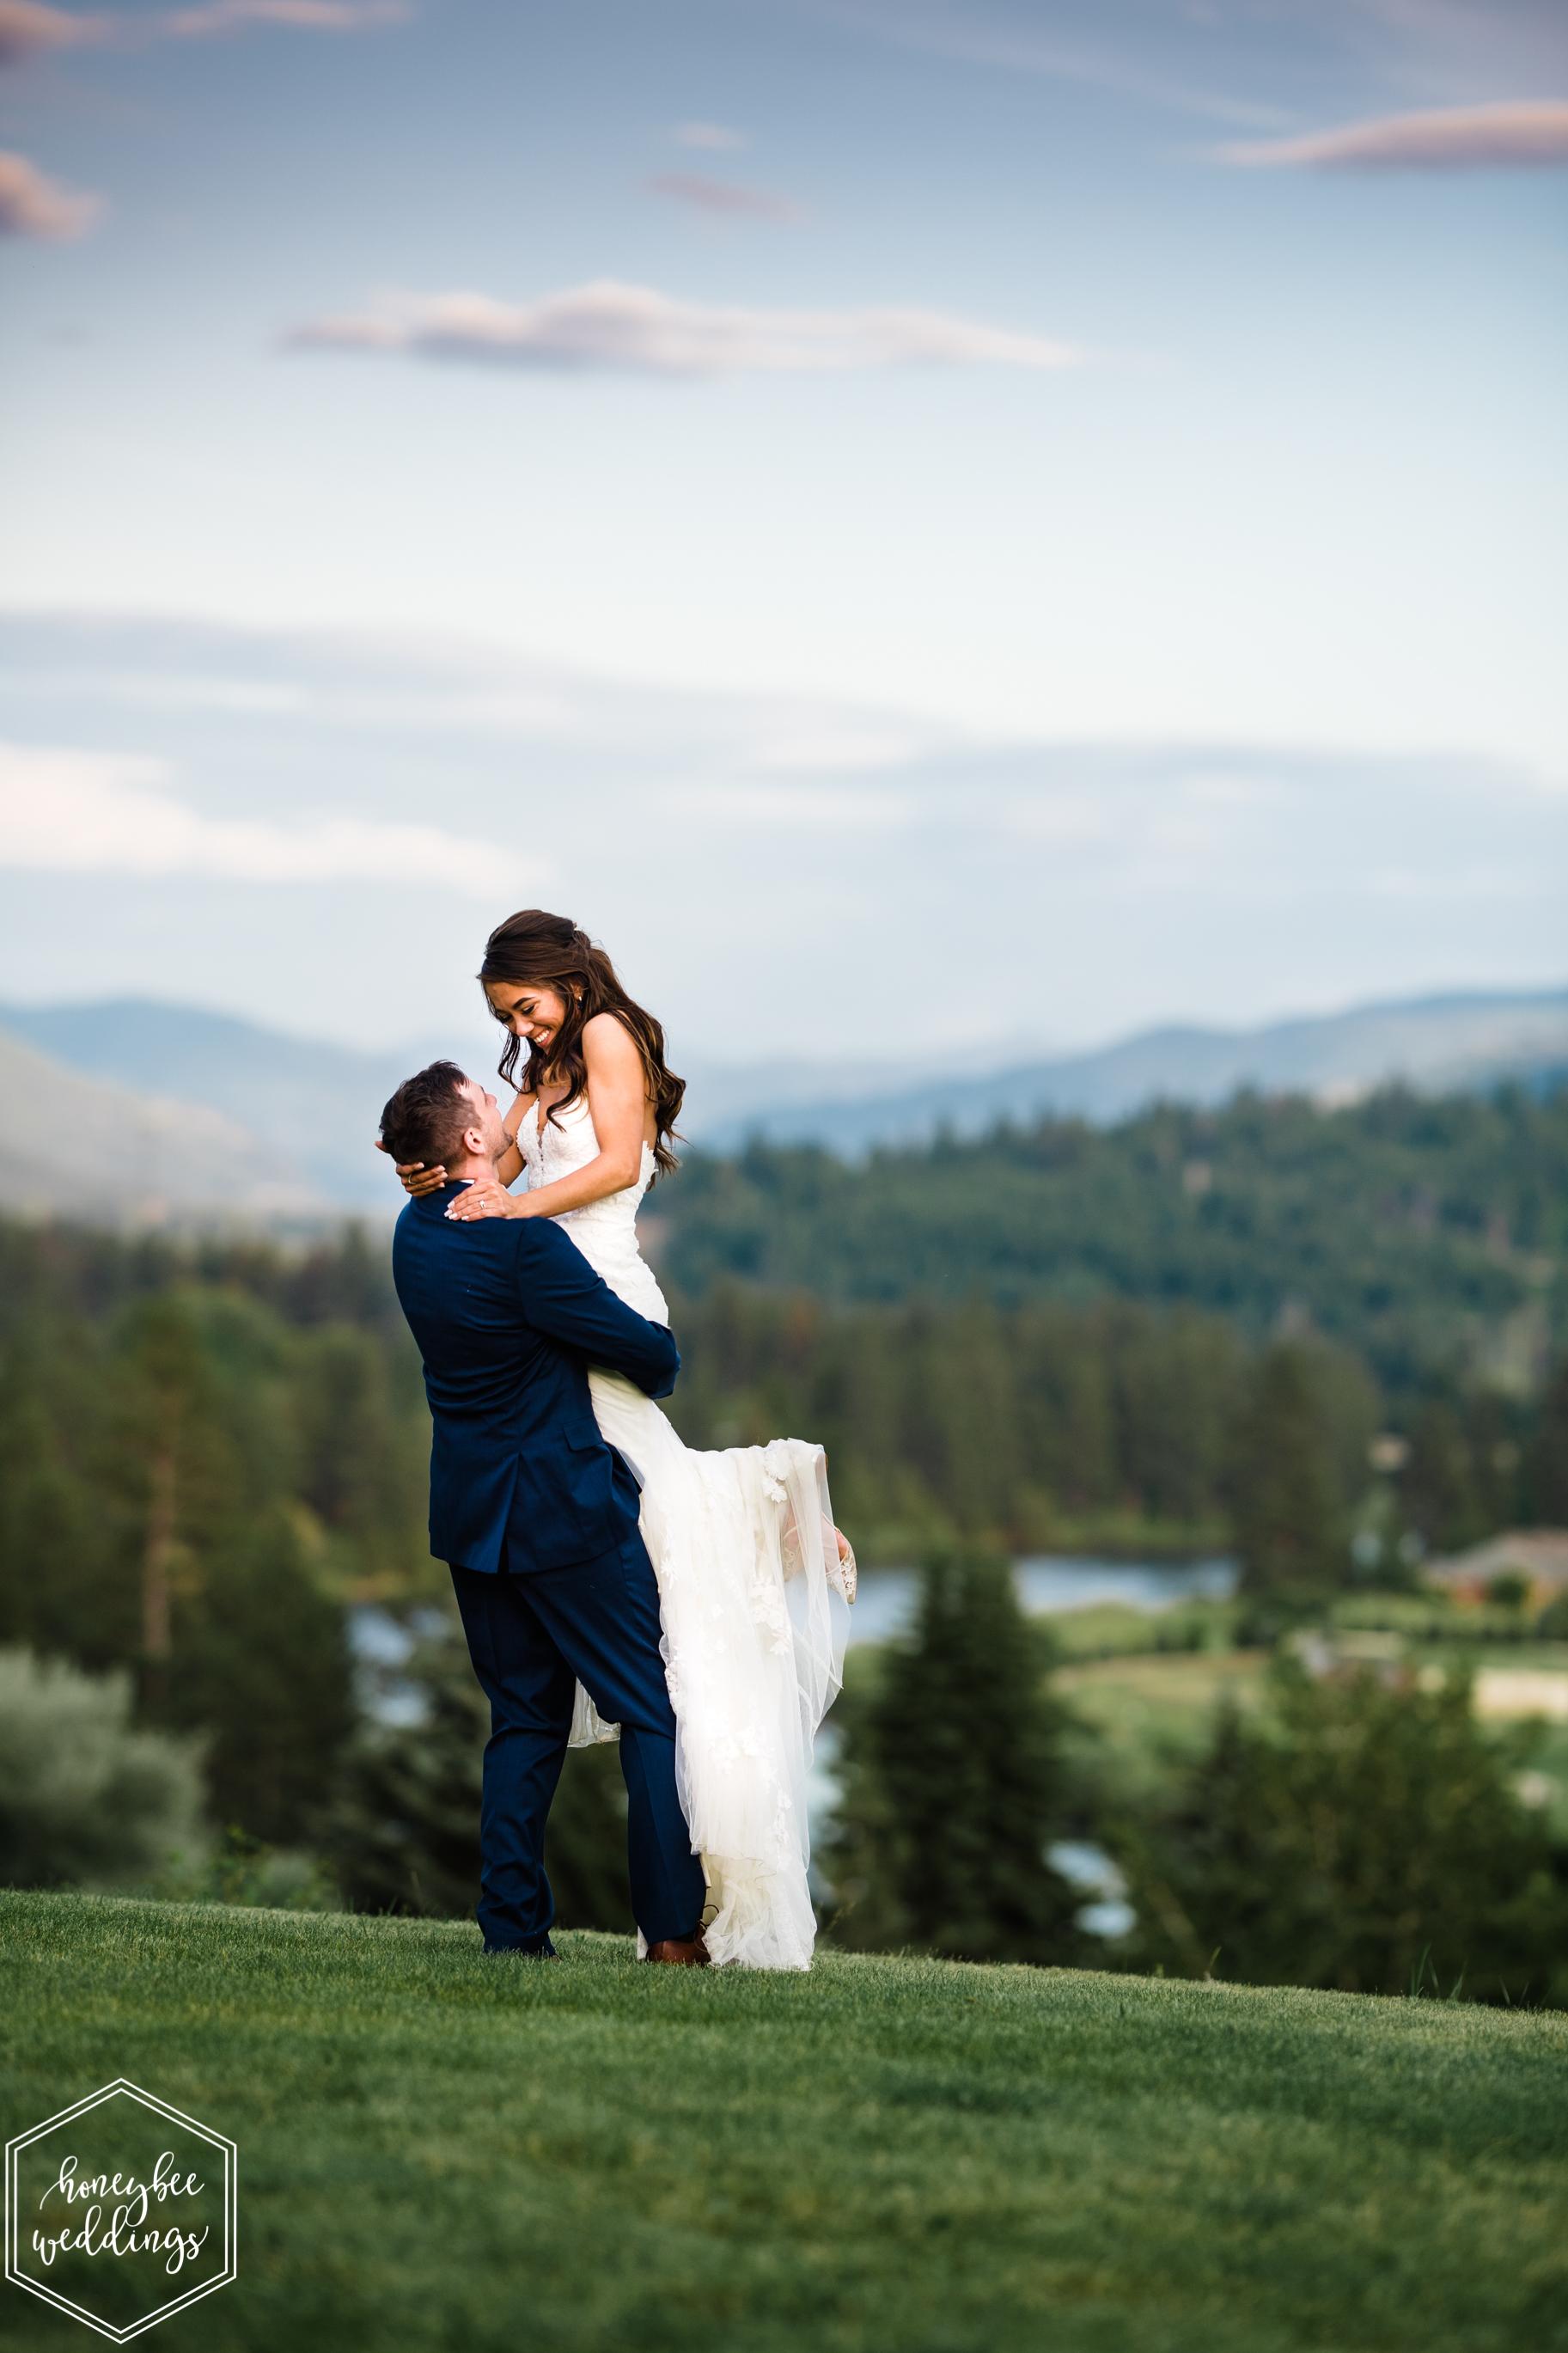 124Montana Wedding Photographer_Missoula Wedding_Honeybee Weddings_Devlin & Jacob_June 22, 2019-2324.jpg